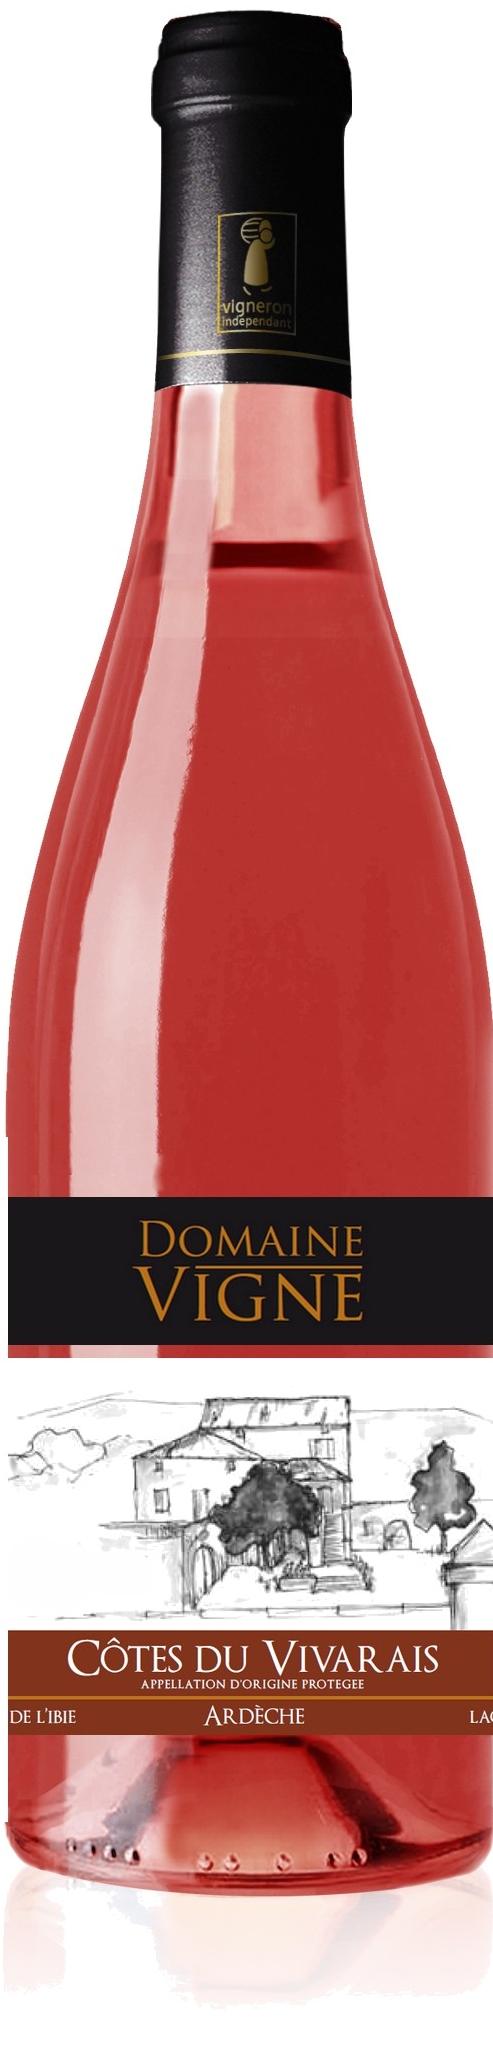 Domaine vigne-cotes vivarais rose 2013